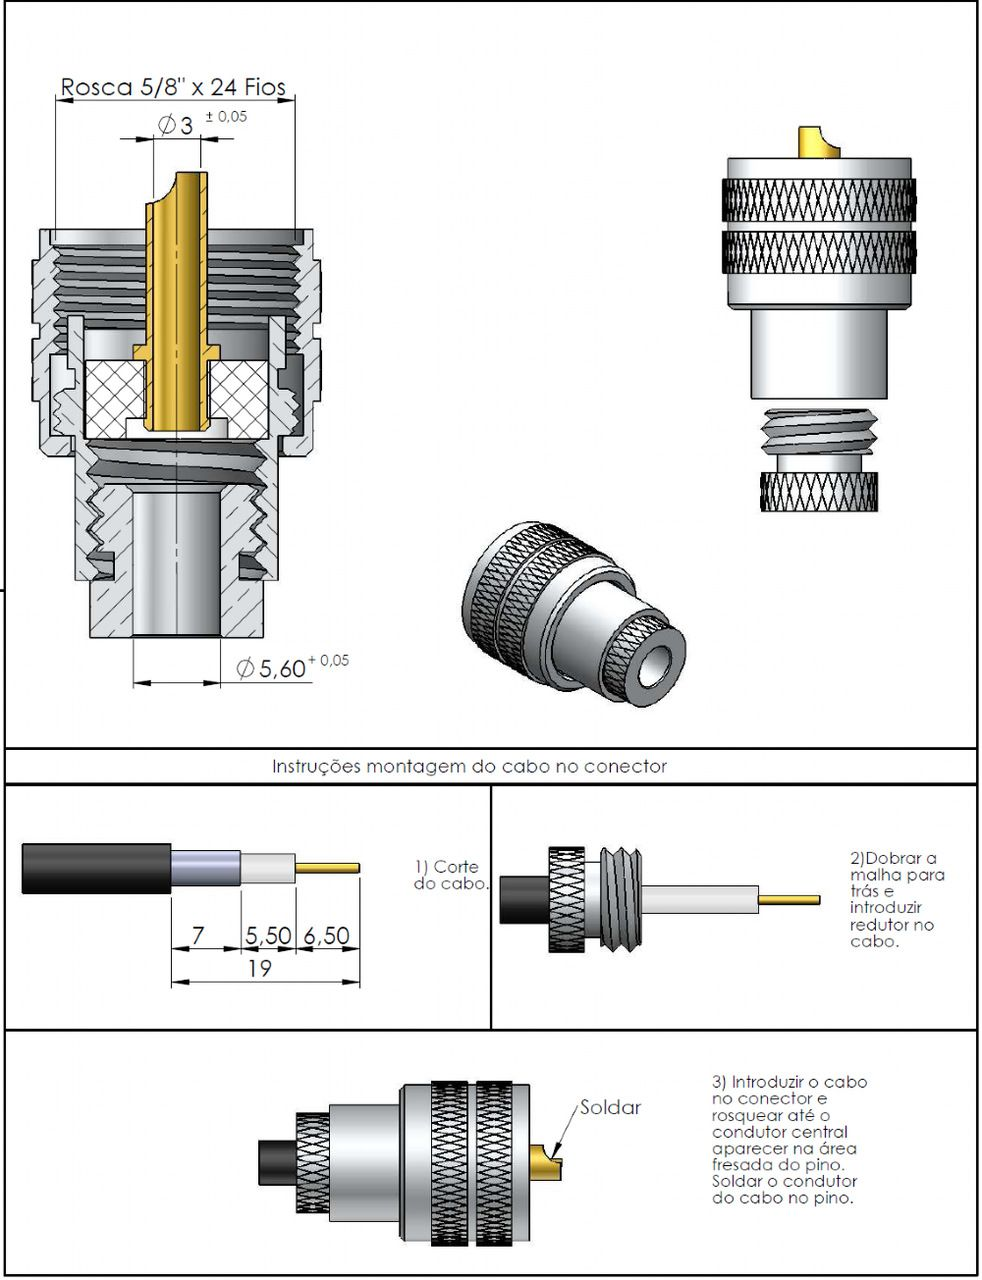 Conector UHF Macho Reto Prensa Cabo Rg/Rgc-58 KM-8